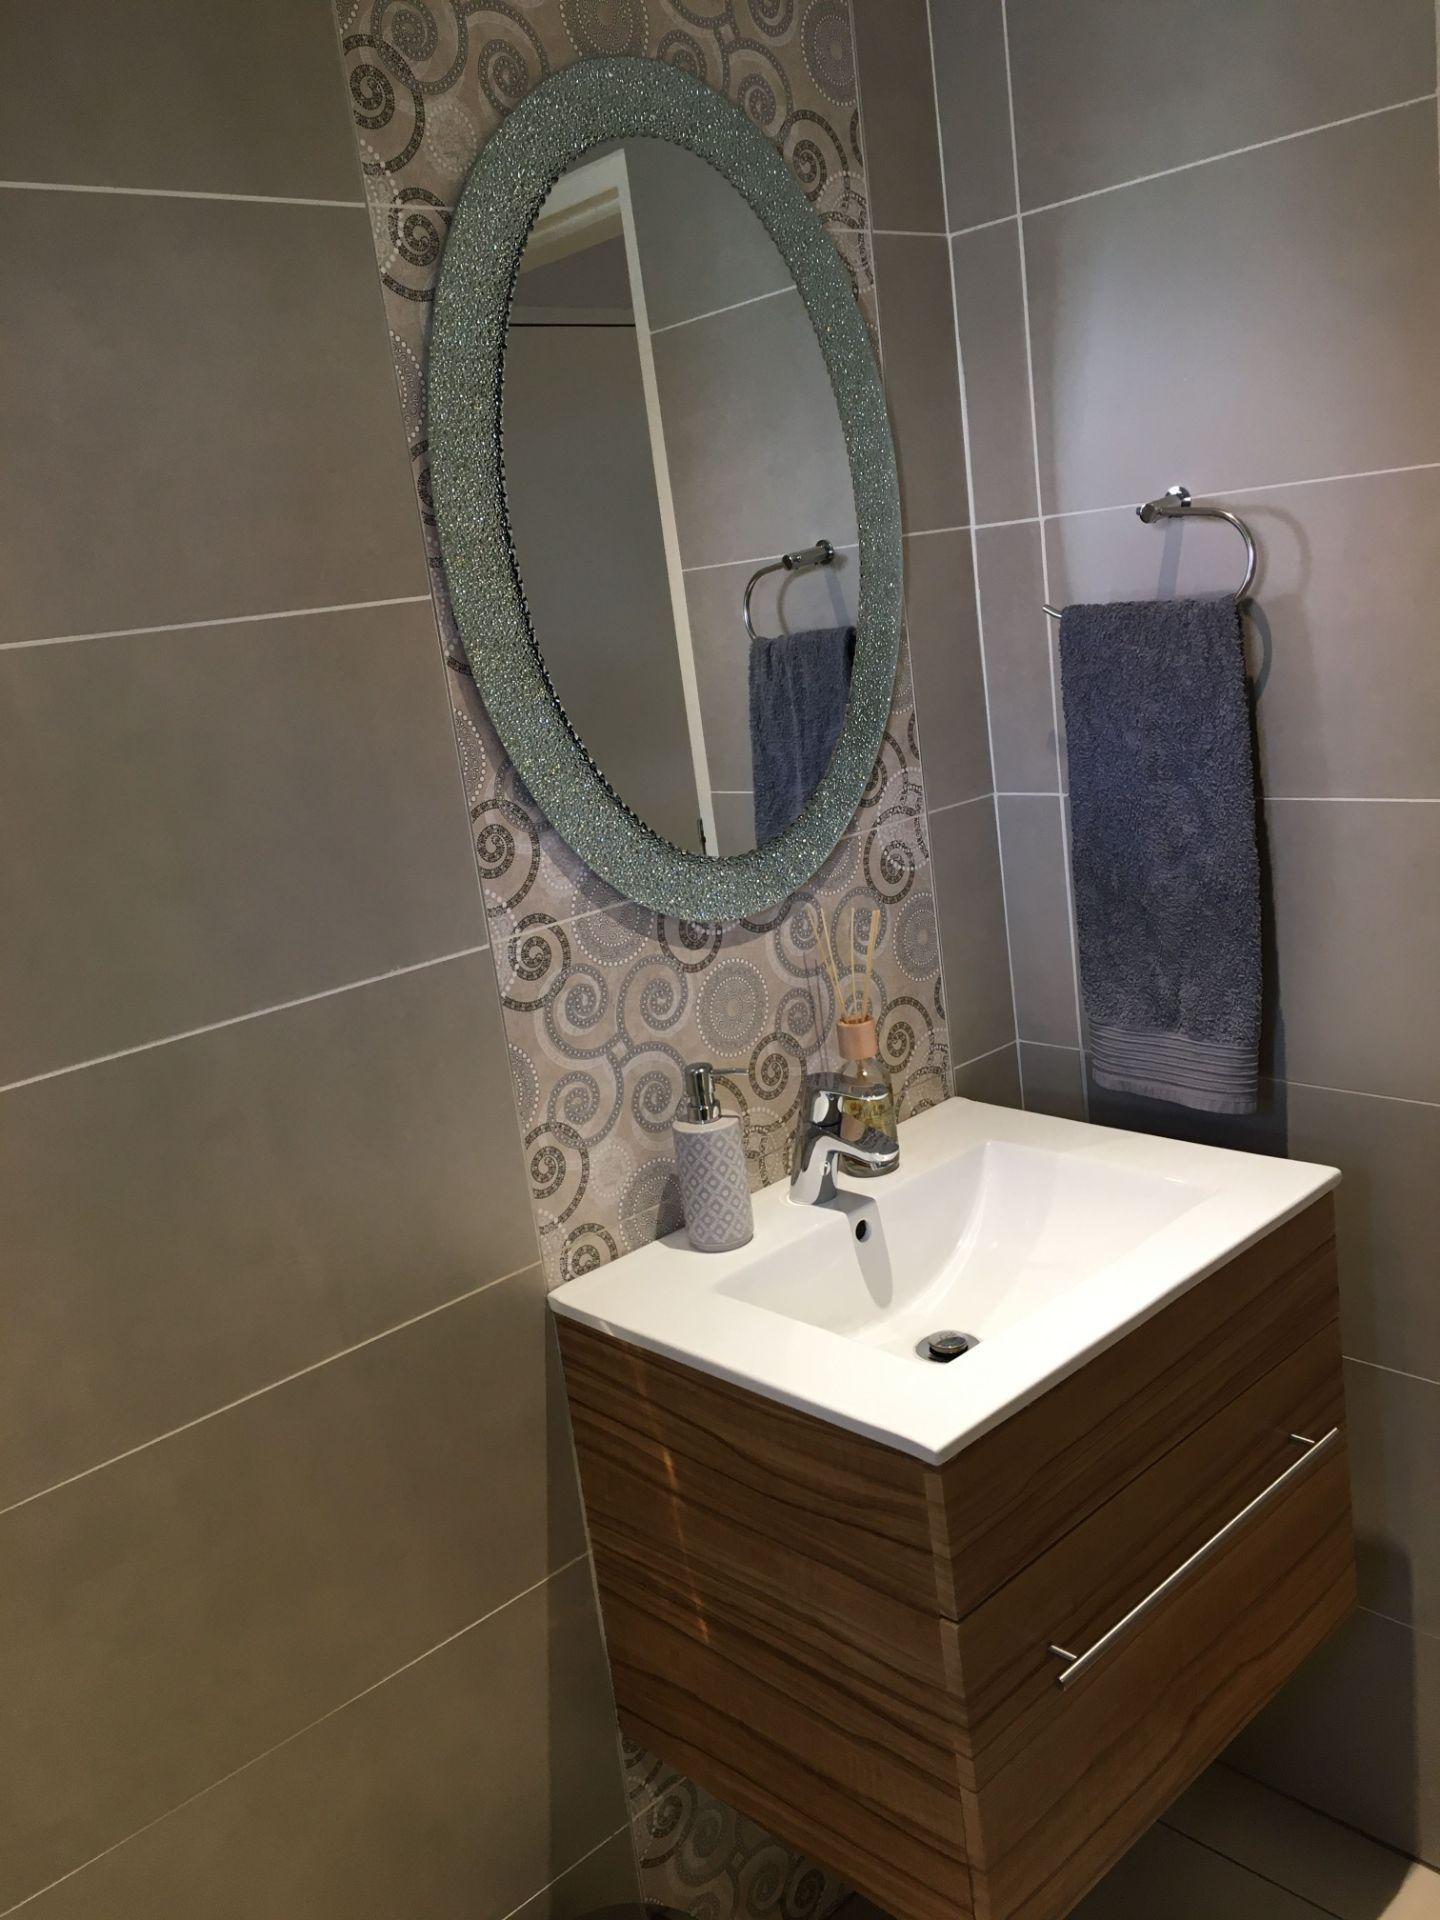 23_VT 23 Bathroom_3.JPG